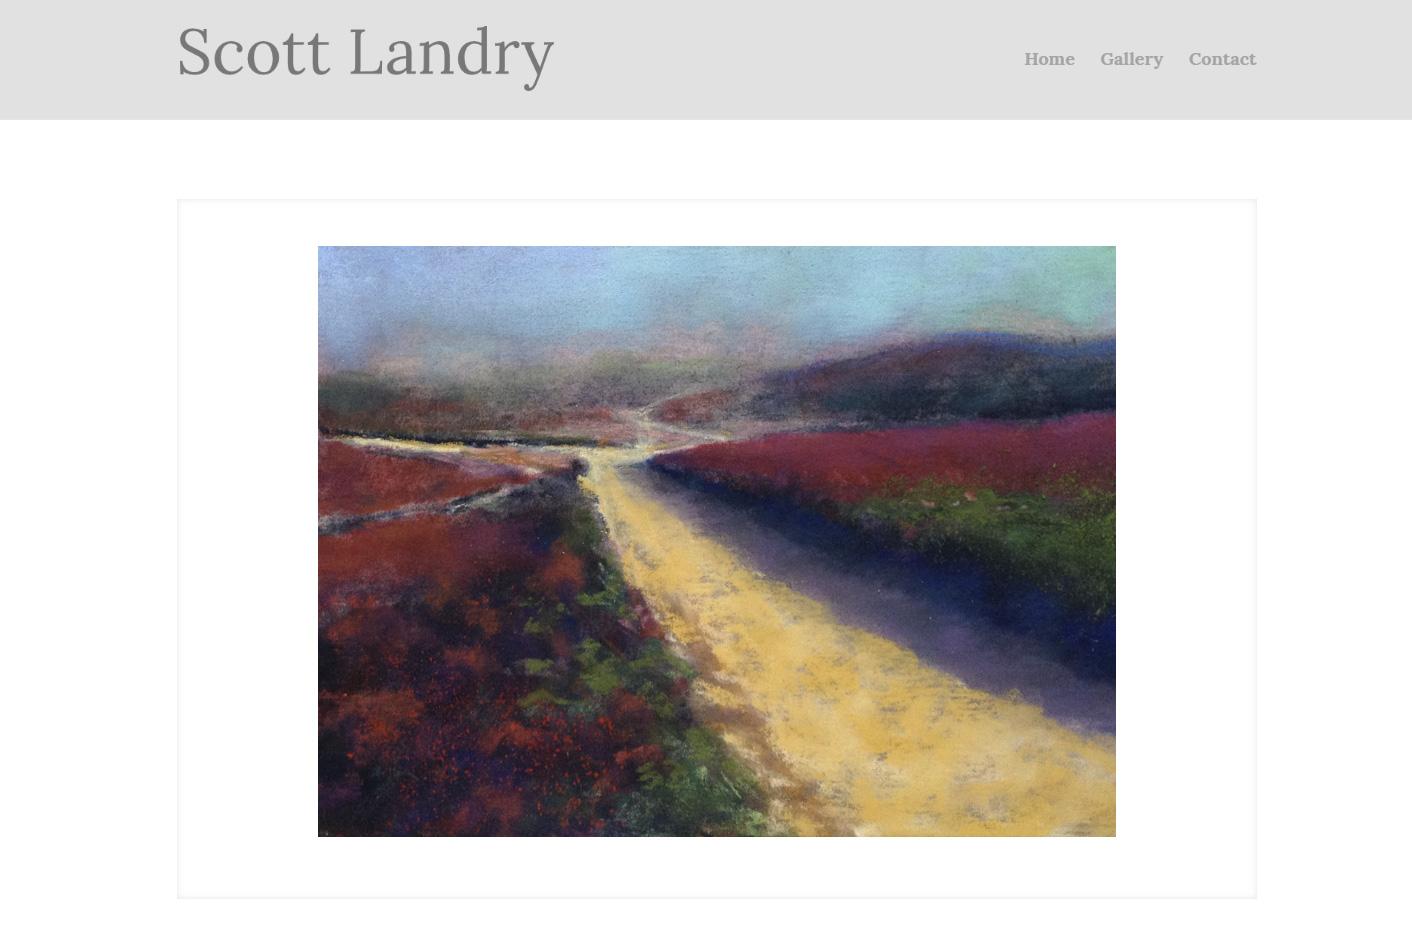 Scott Landry Art